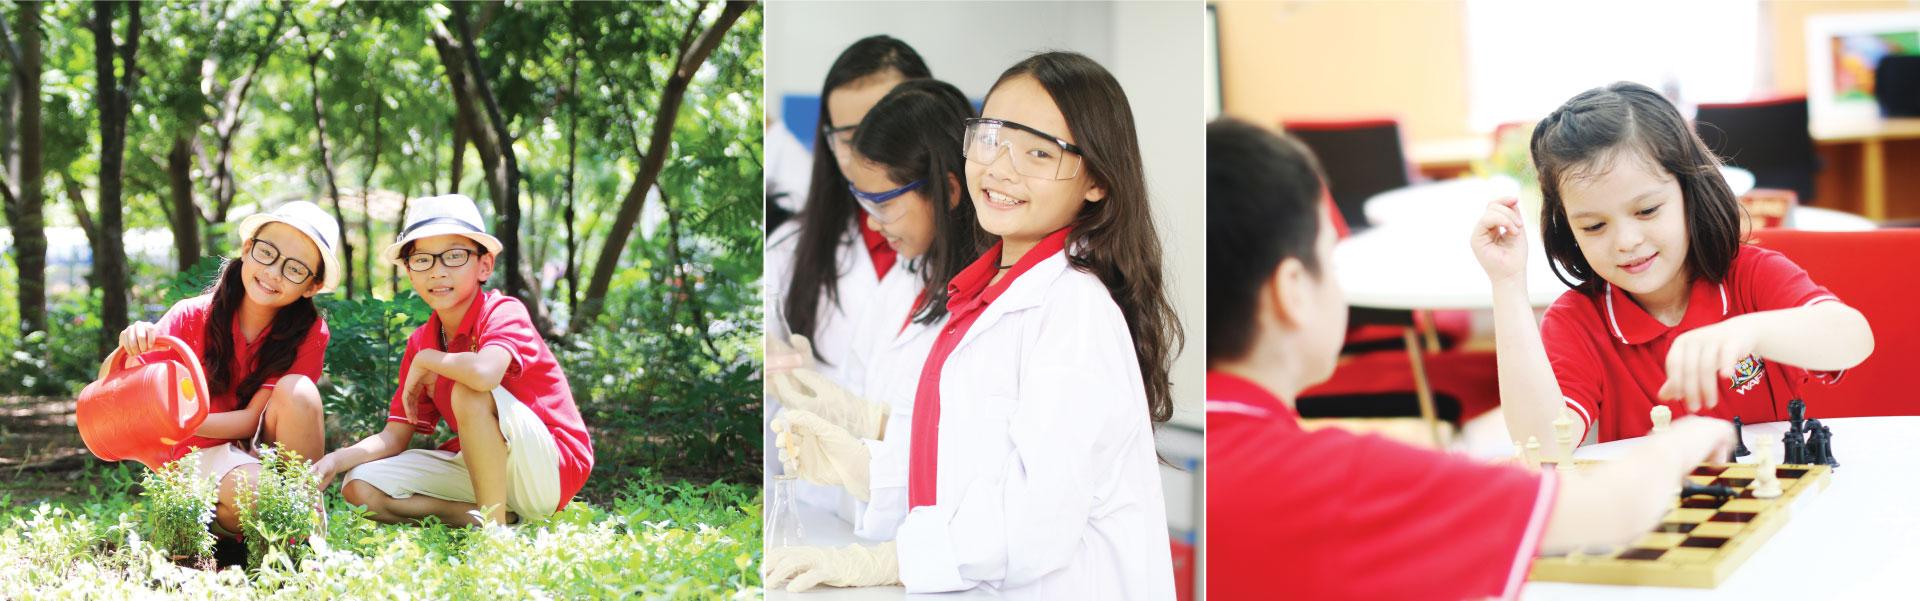 International Education Program